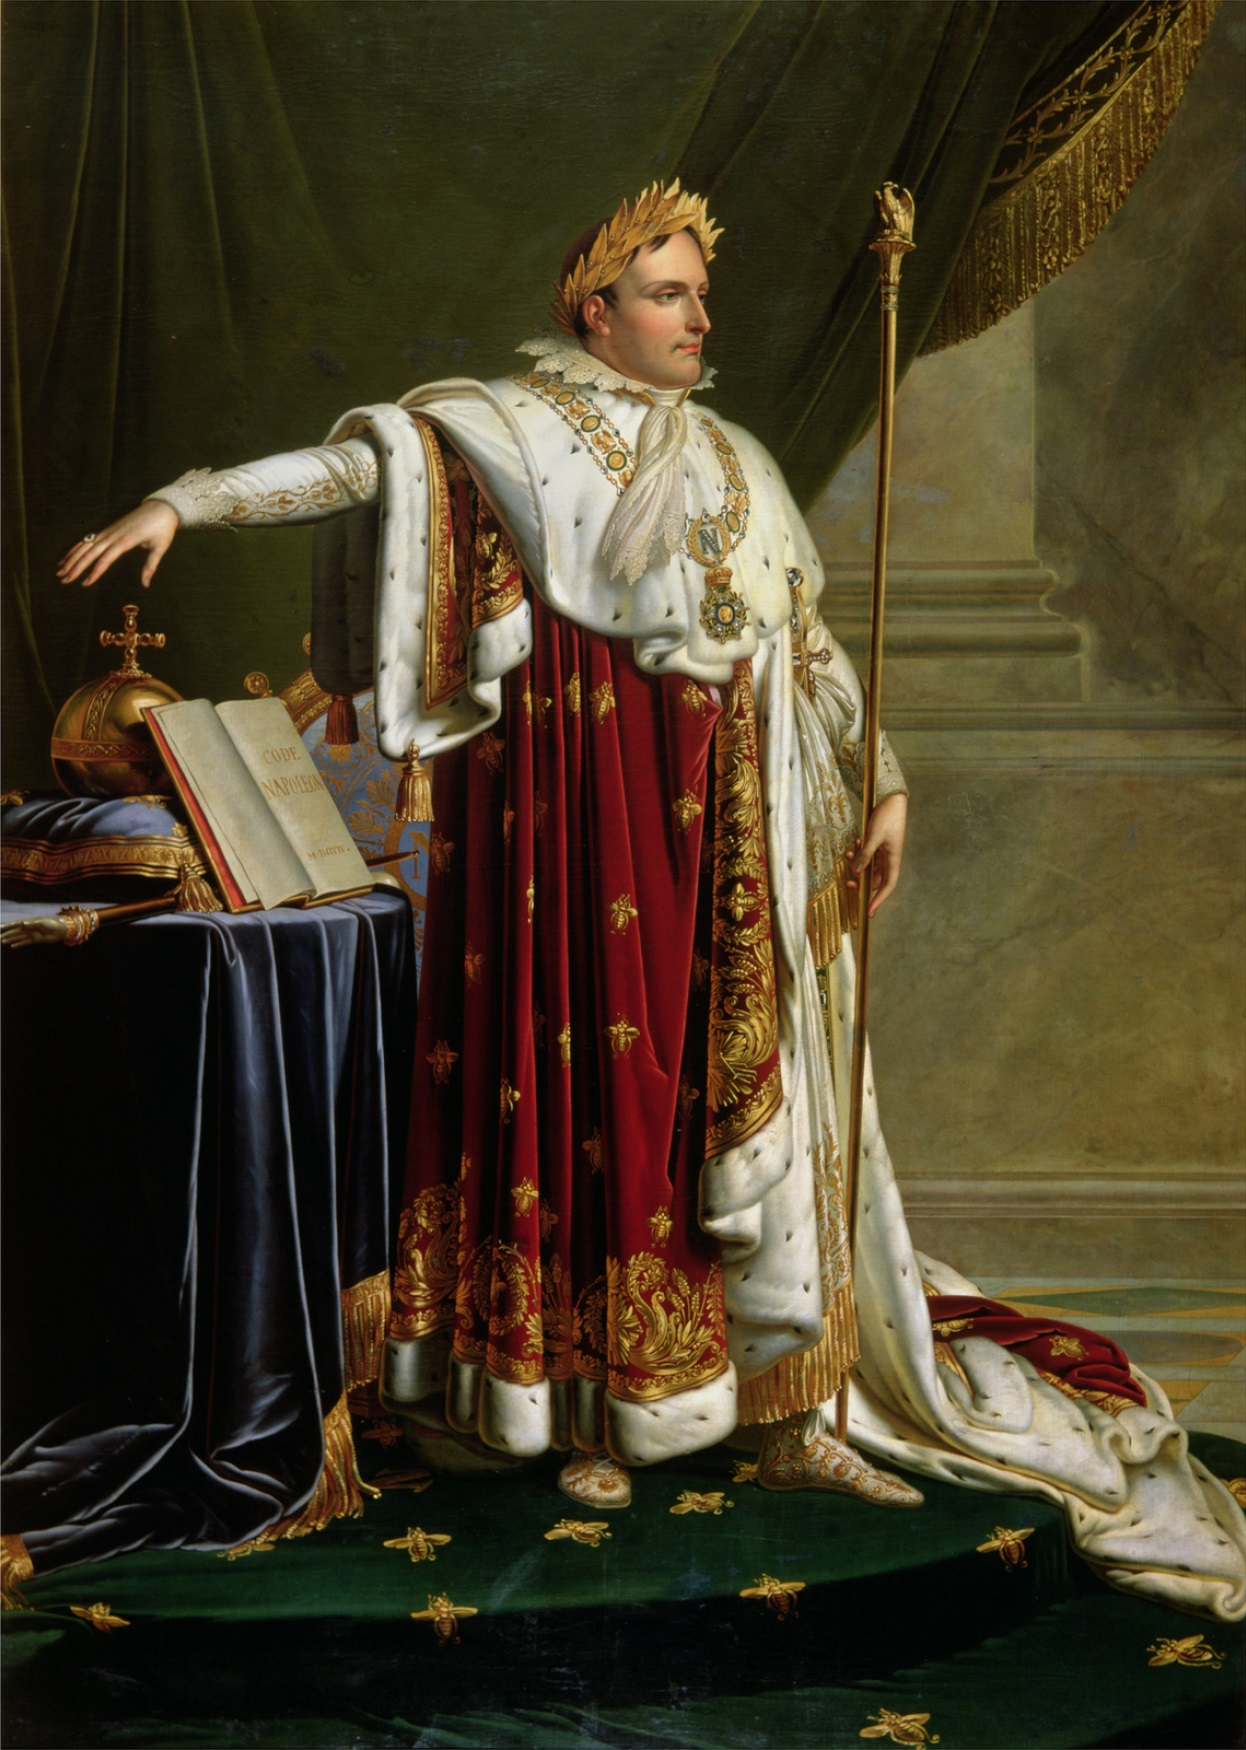 BWM227006 Portrait of Napoleon Bonaparte (1769-1821) (oil on canvas) by Girodet de Roucy-Trioson, Anne Louis (1767-1824); © The Bowes Museum, Barnard Castle, County Durham, UK; French, out of copyright